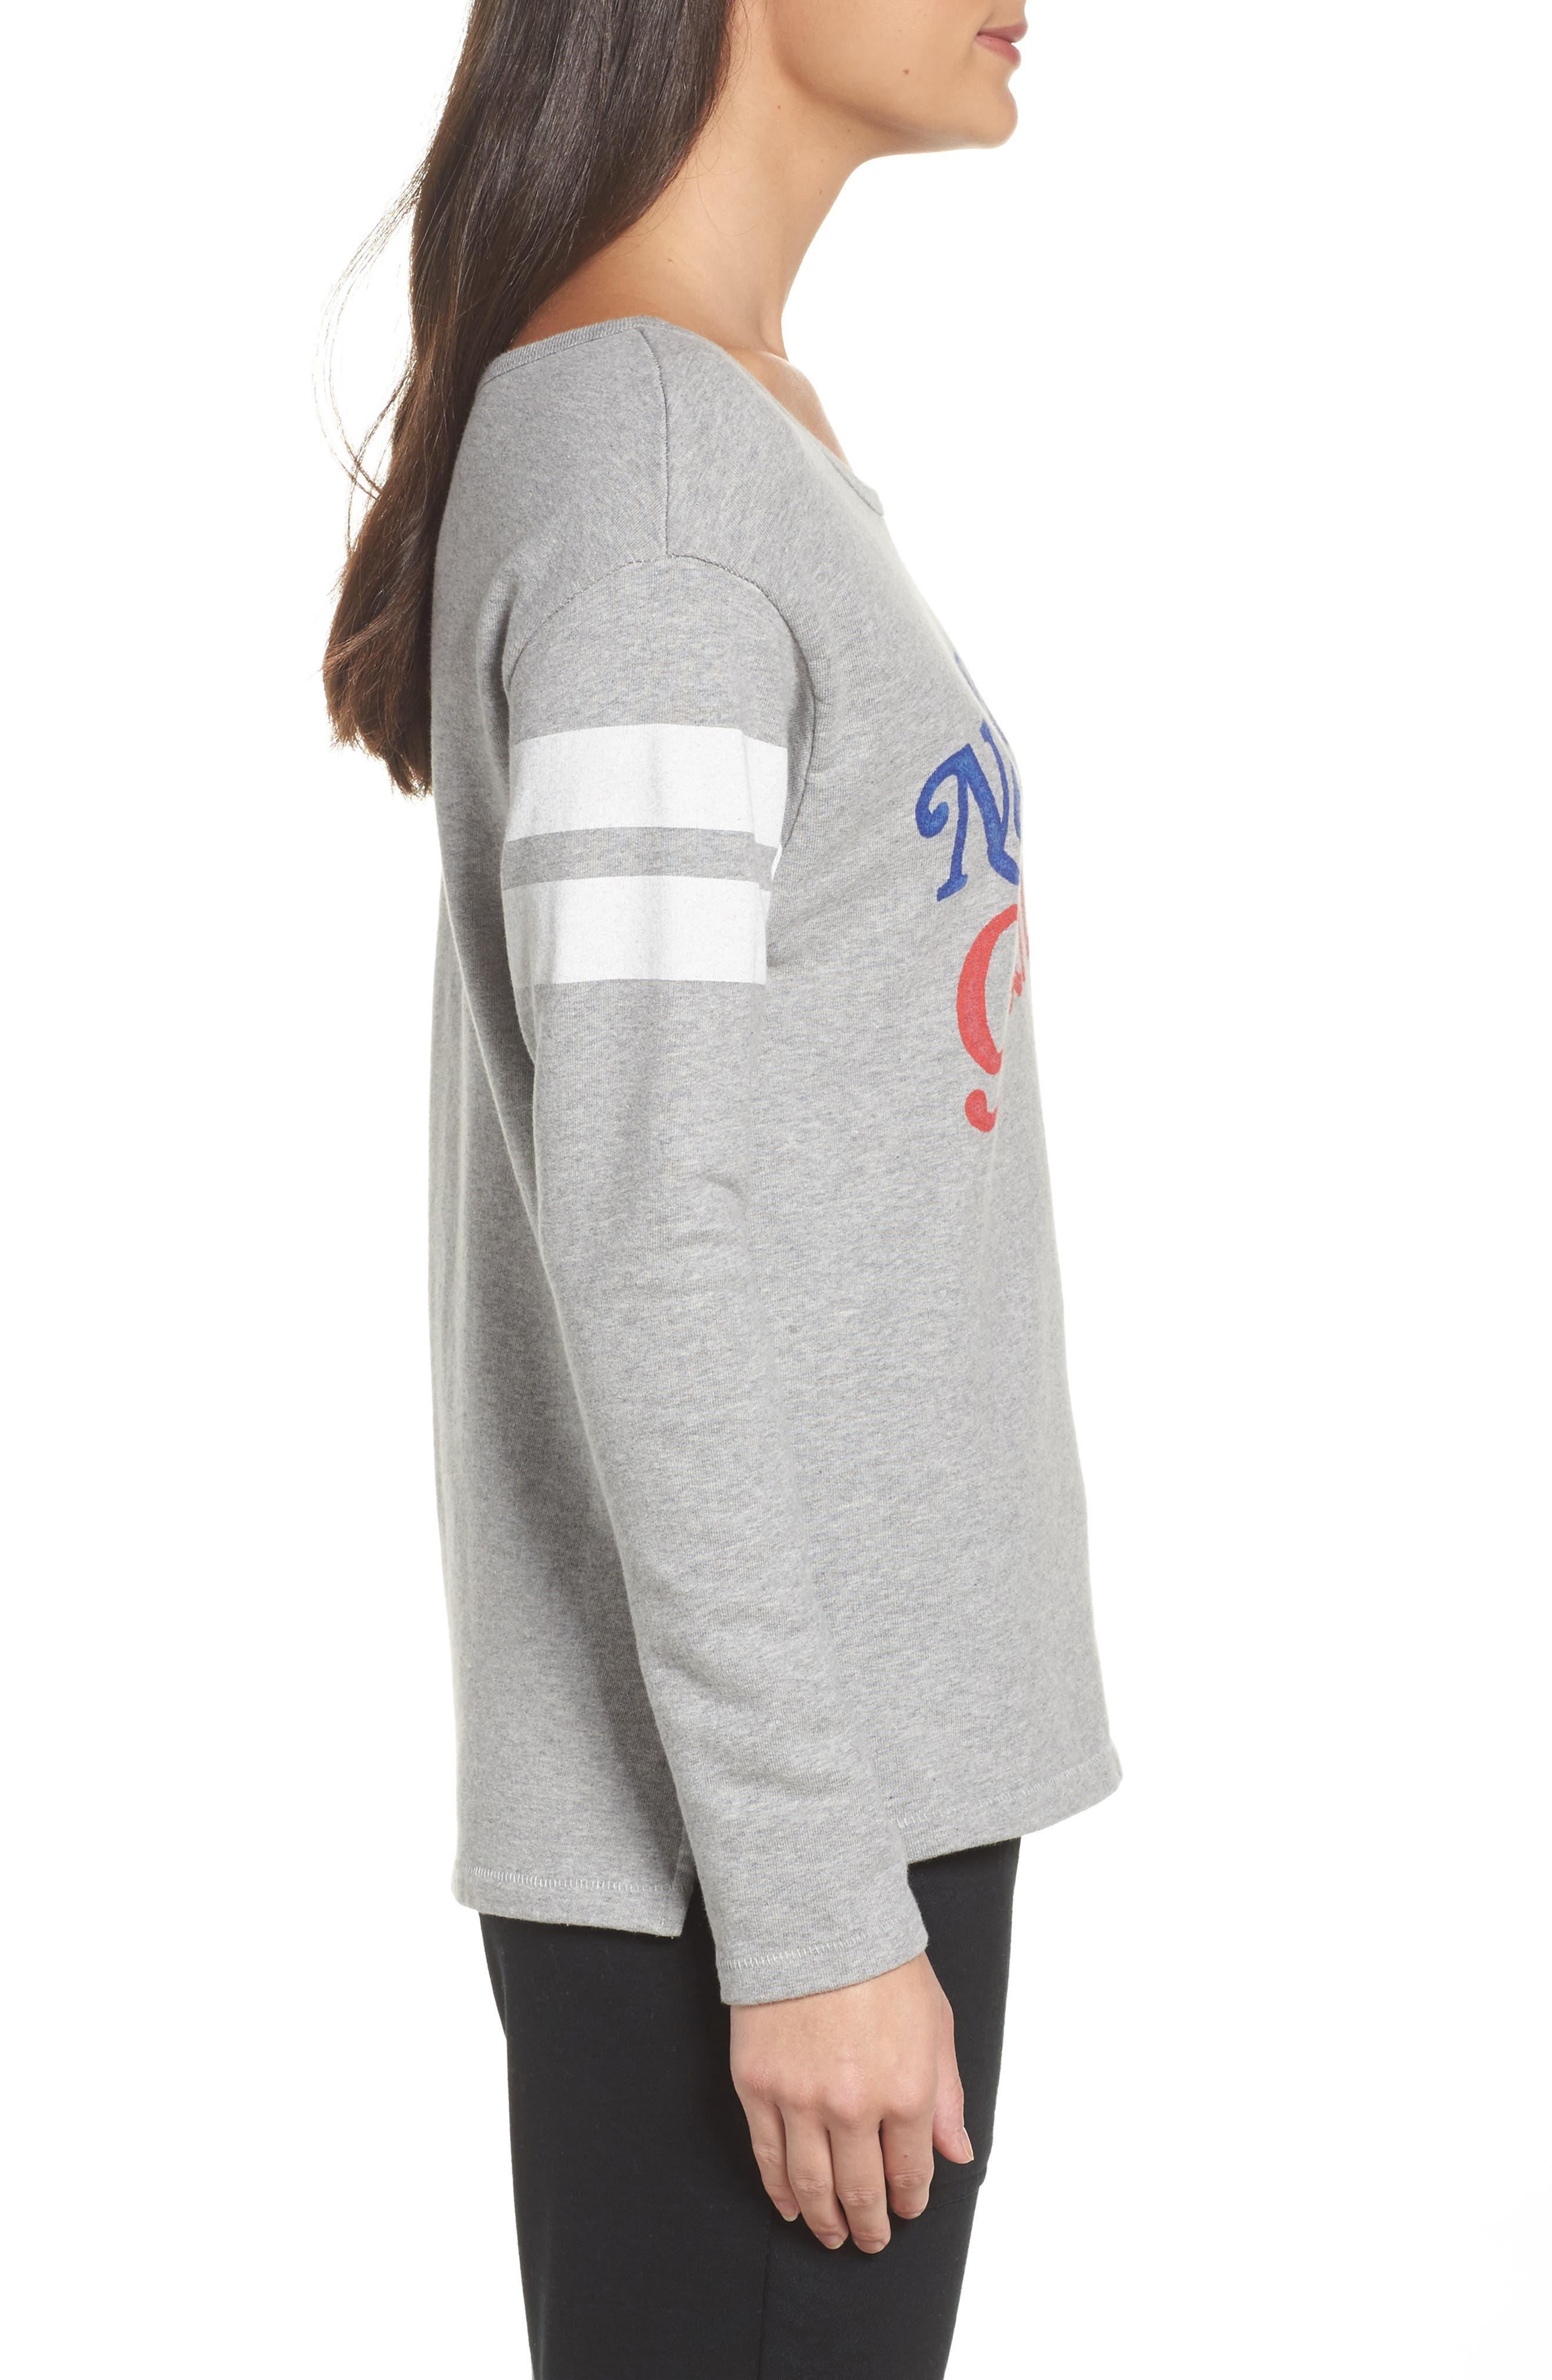 NFL New York Giants Champion Sweatshirt,                             Alternate thumbnail 3, color,                             028